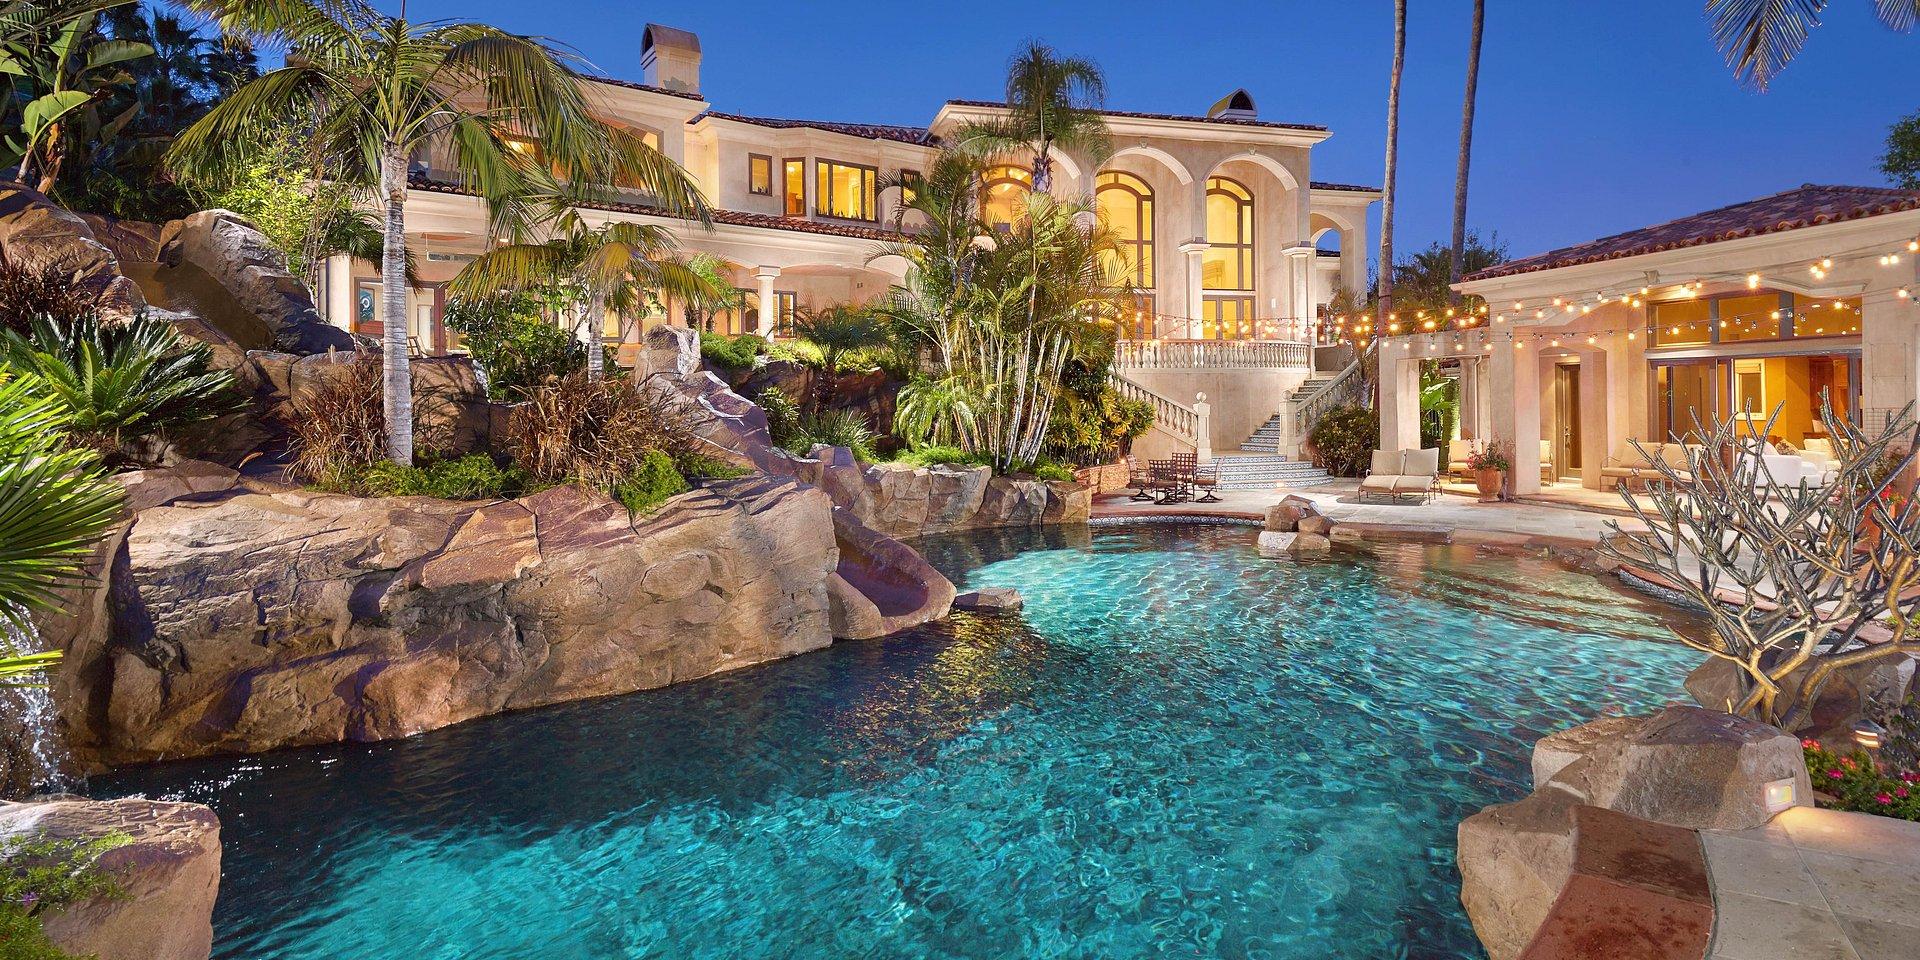 Coldwell Banker Residential Brokerage Lists San Juan Capistrano Property for $5.695 Million